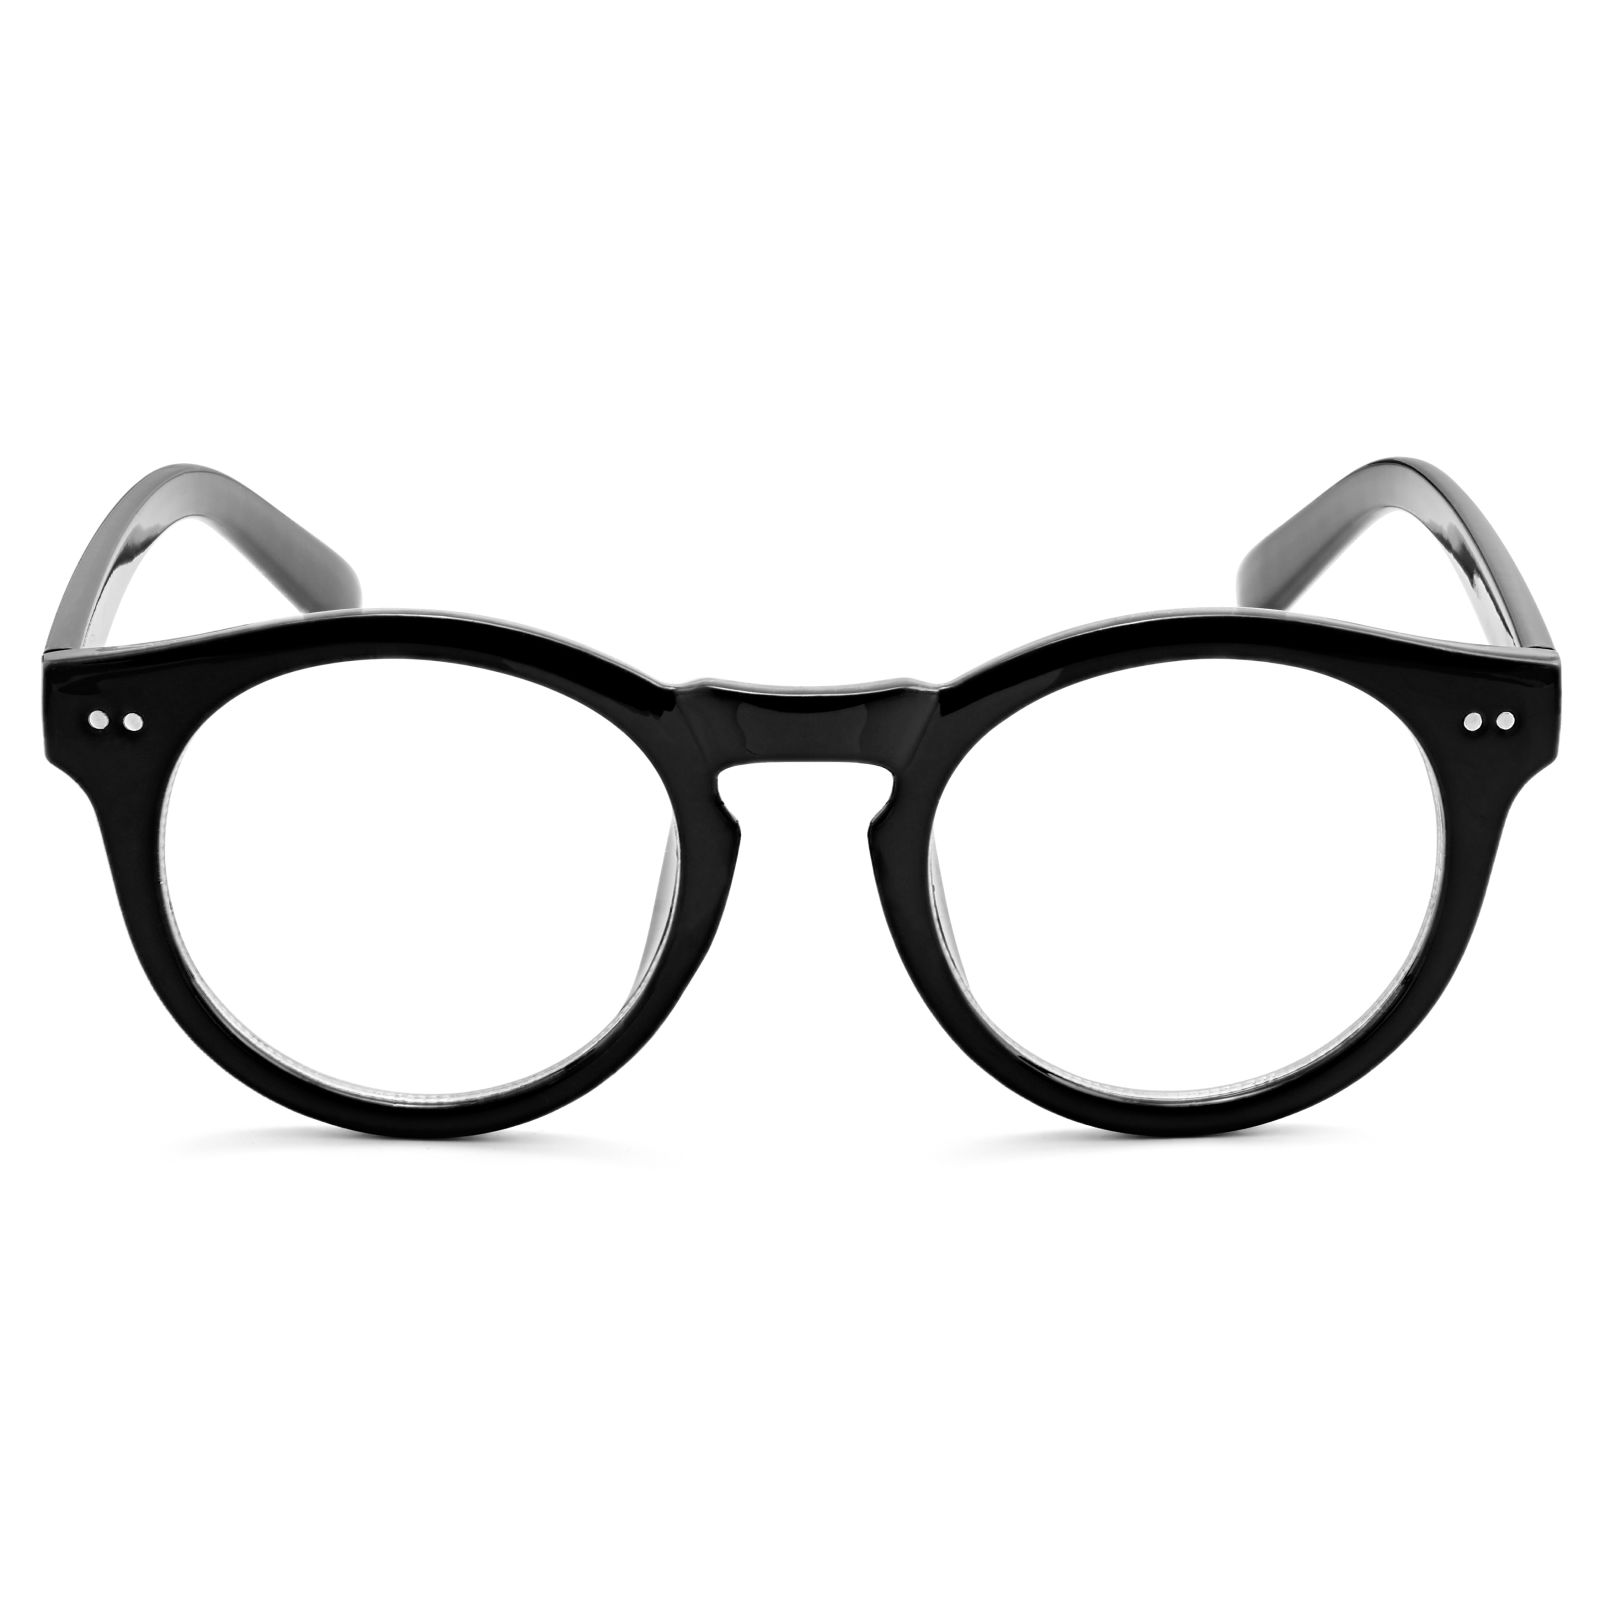 990284361d Μαύρα Γυαλιά με Διάφανους Φακούς The Protege